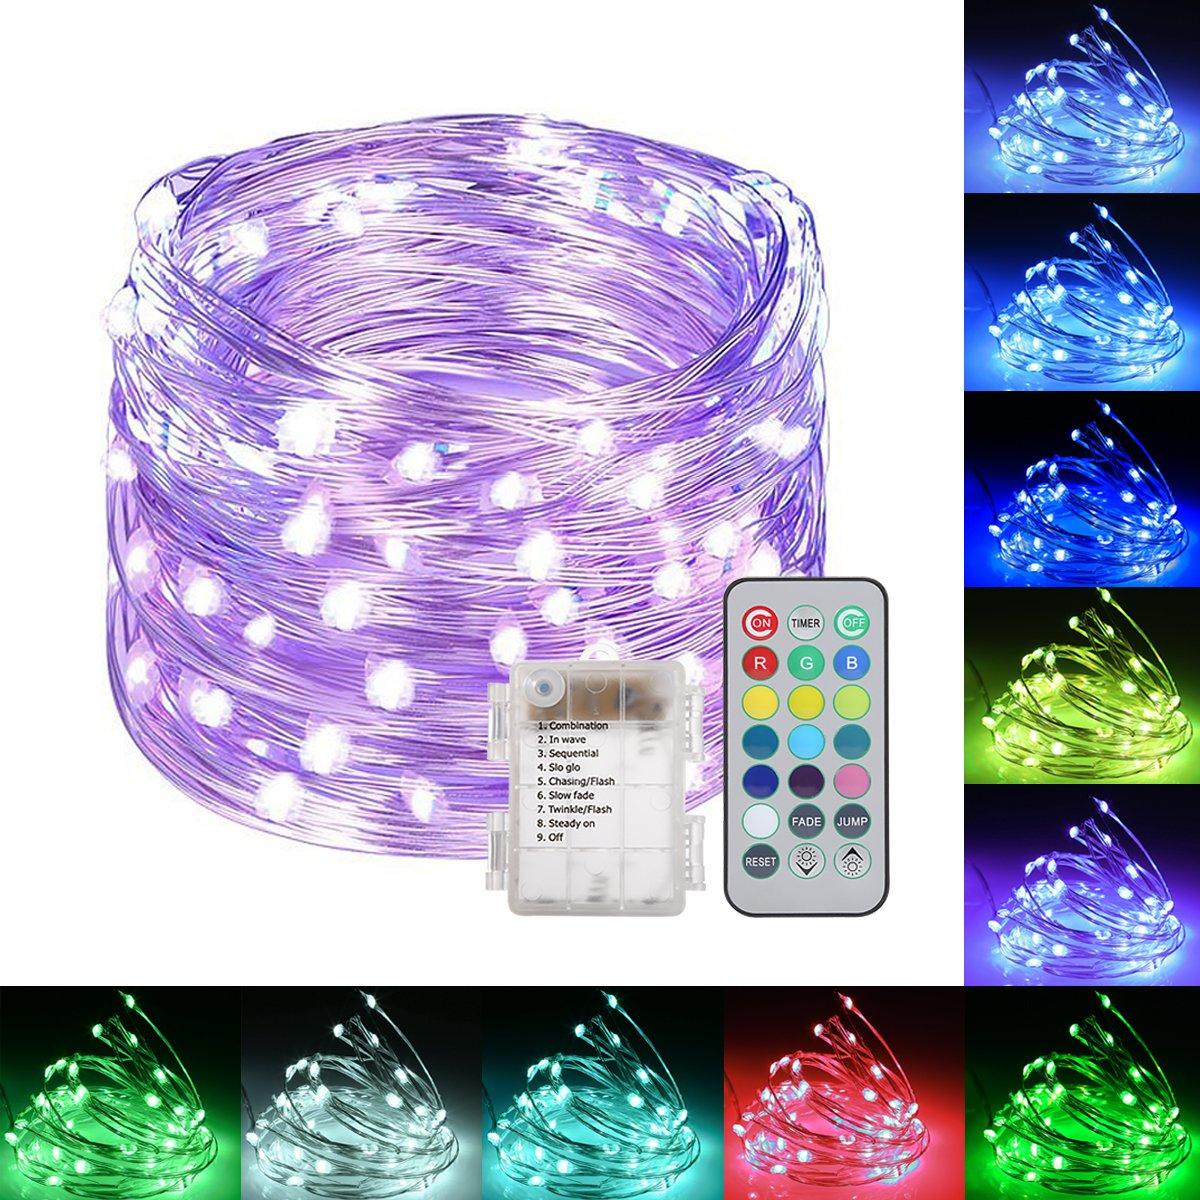 Smart&green Lighting String Lights, S&G Fairy Lights Waterproof Dimmable/Timmer Decorative Lights for Garden Patio (Model 7)